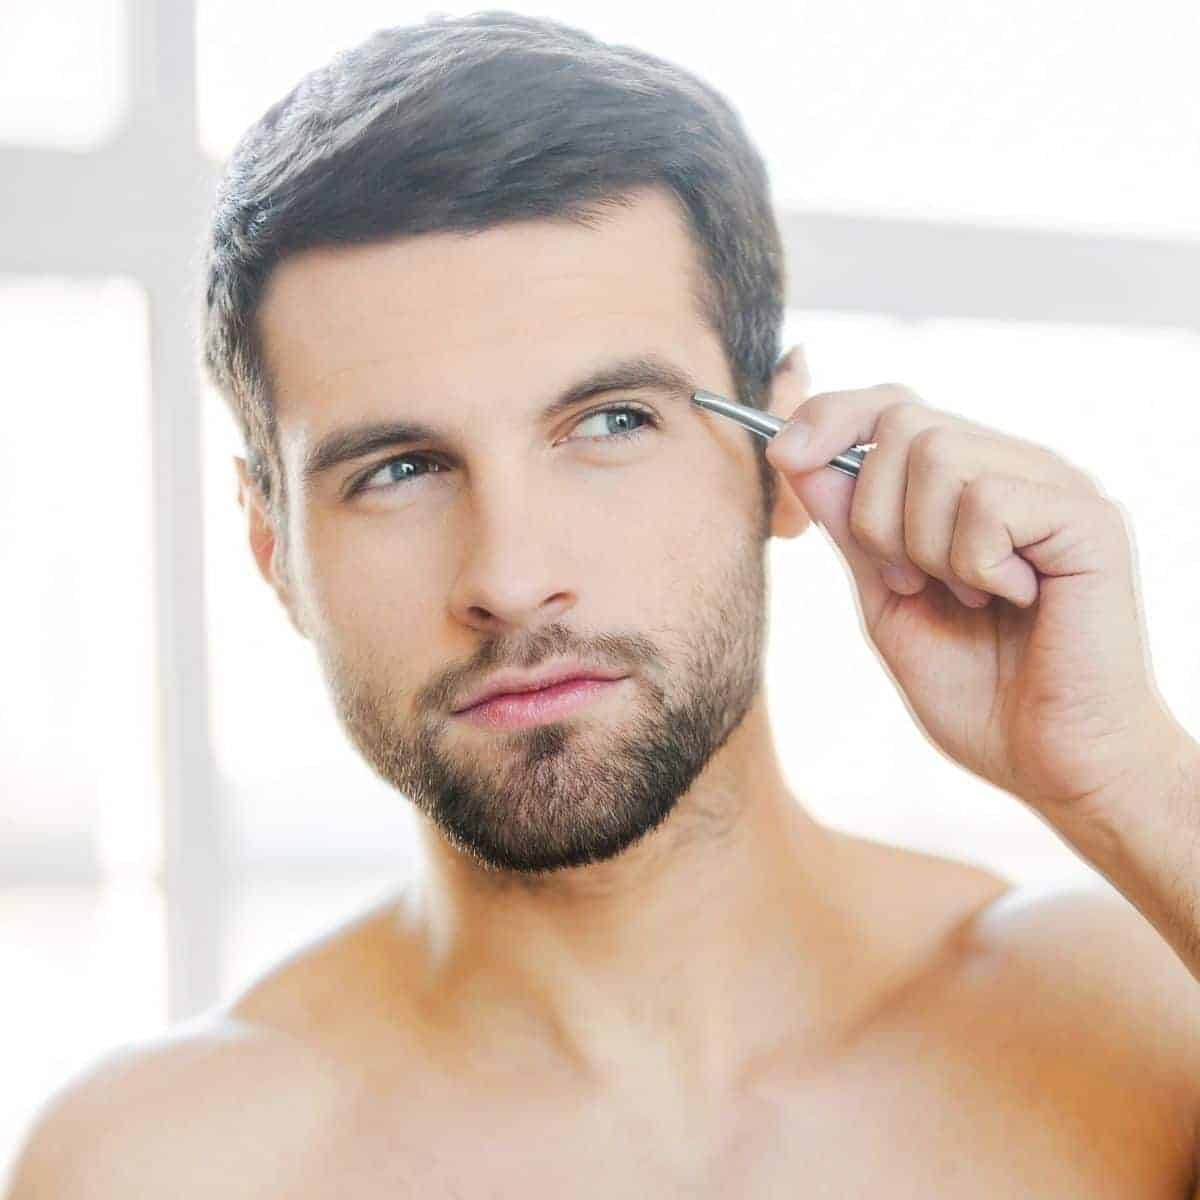 Man plucking eyebrow.